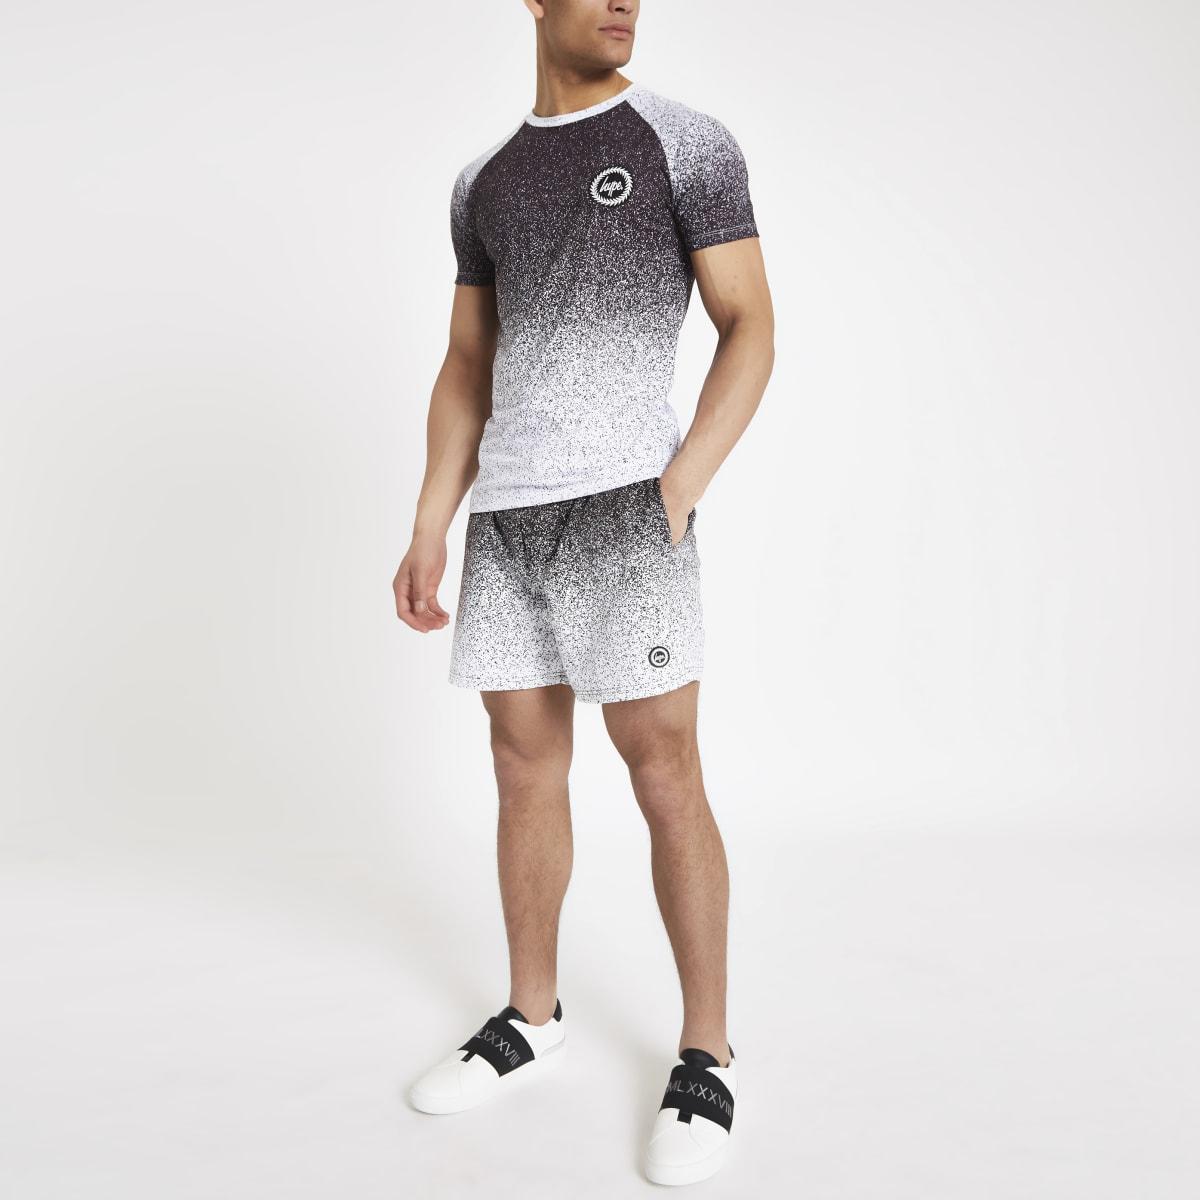 Hype black speckle fade print T-shirt